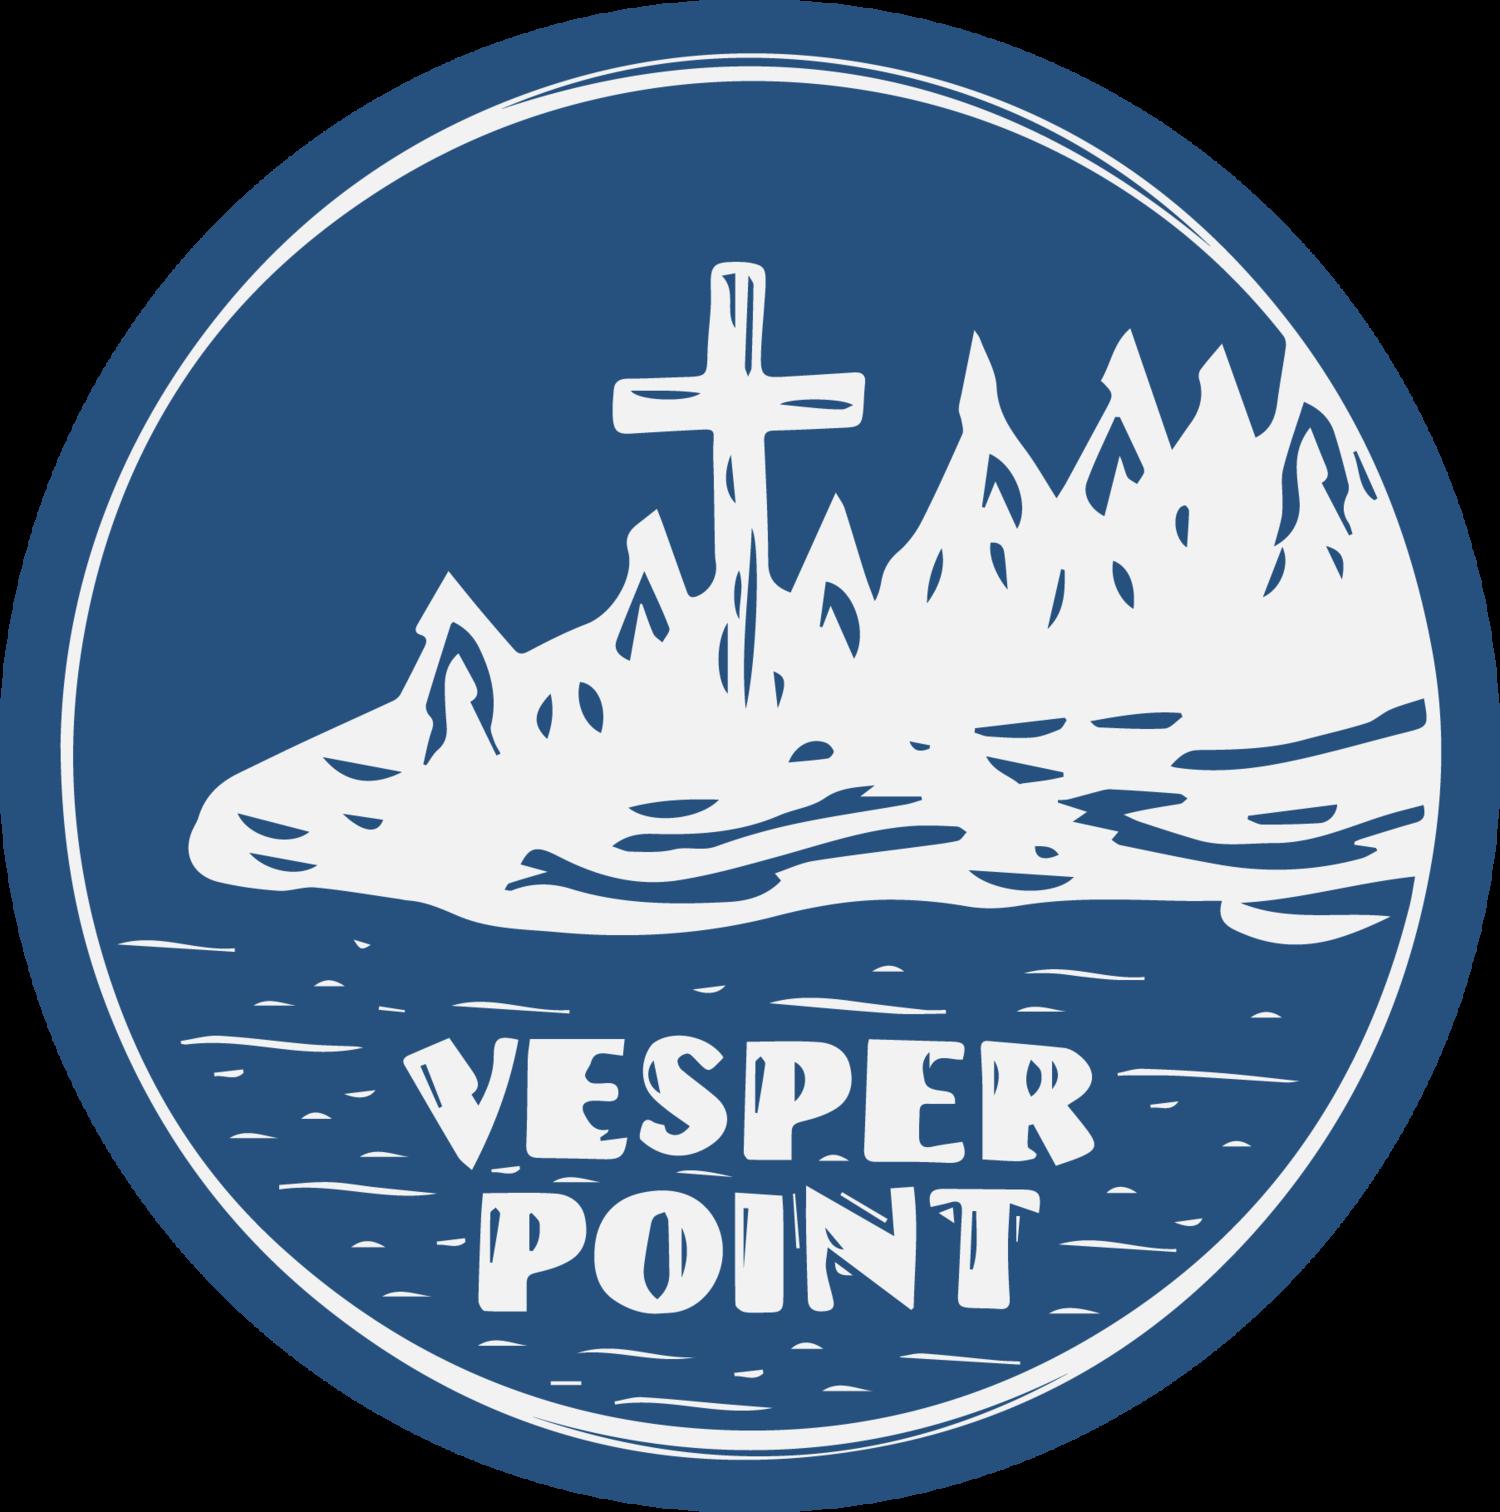 Vesper Point